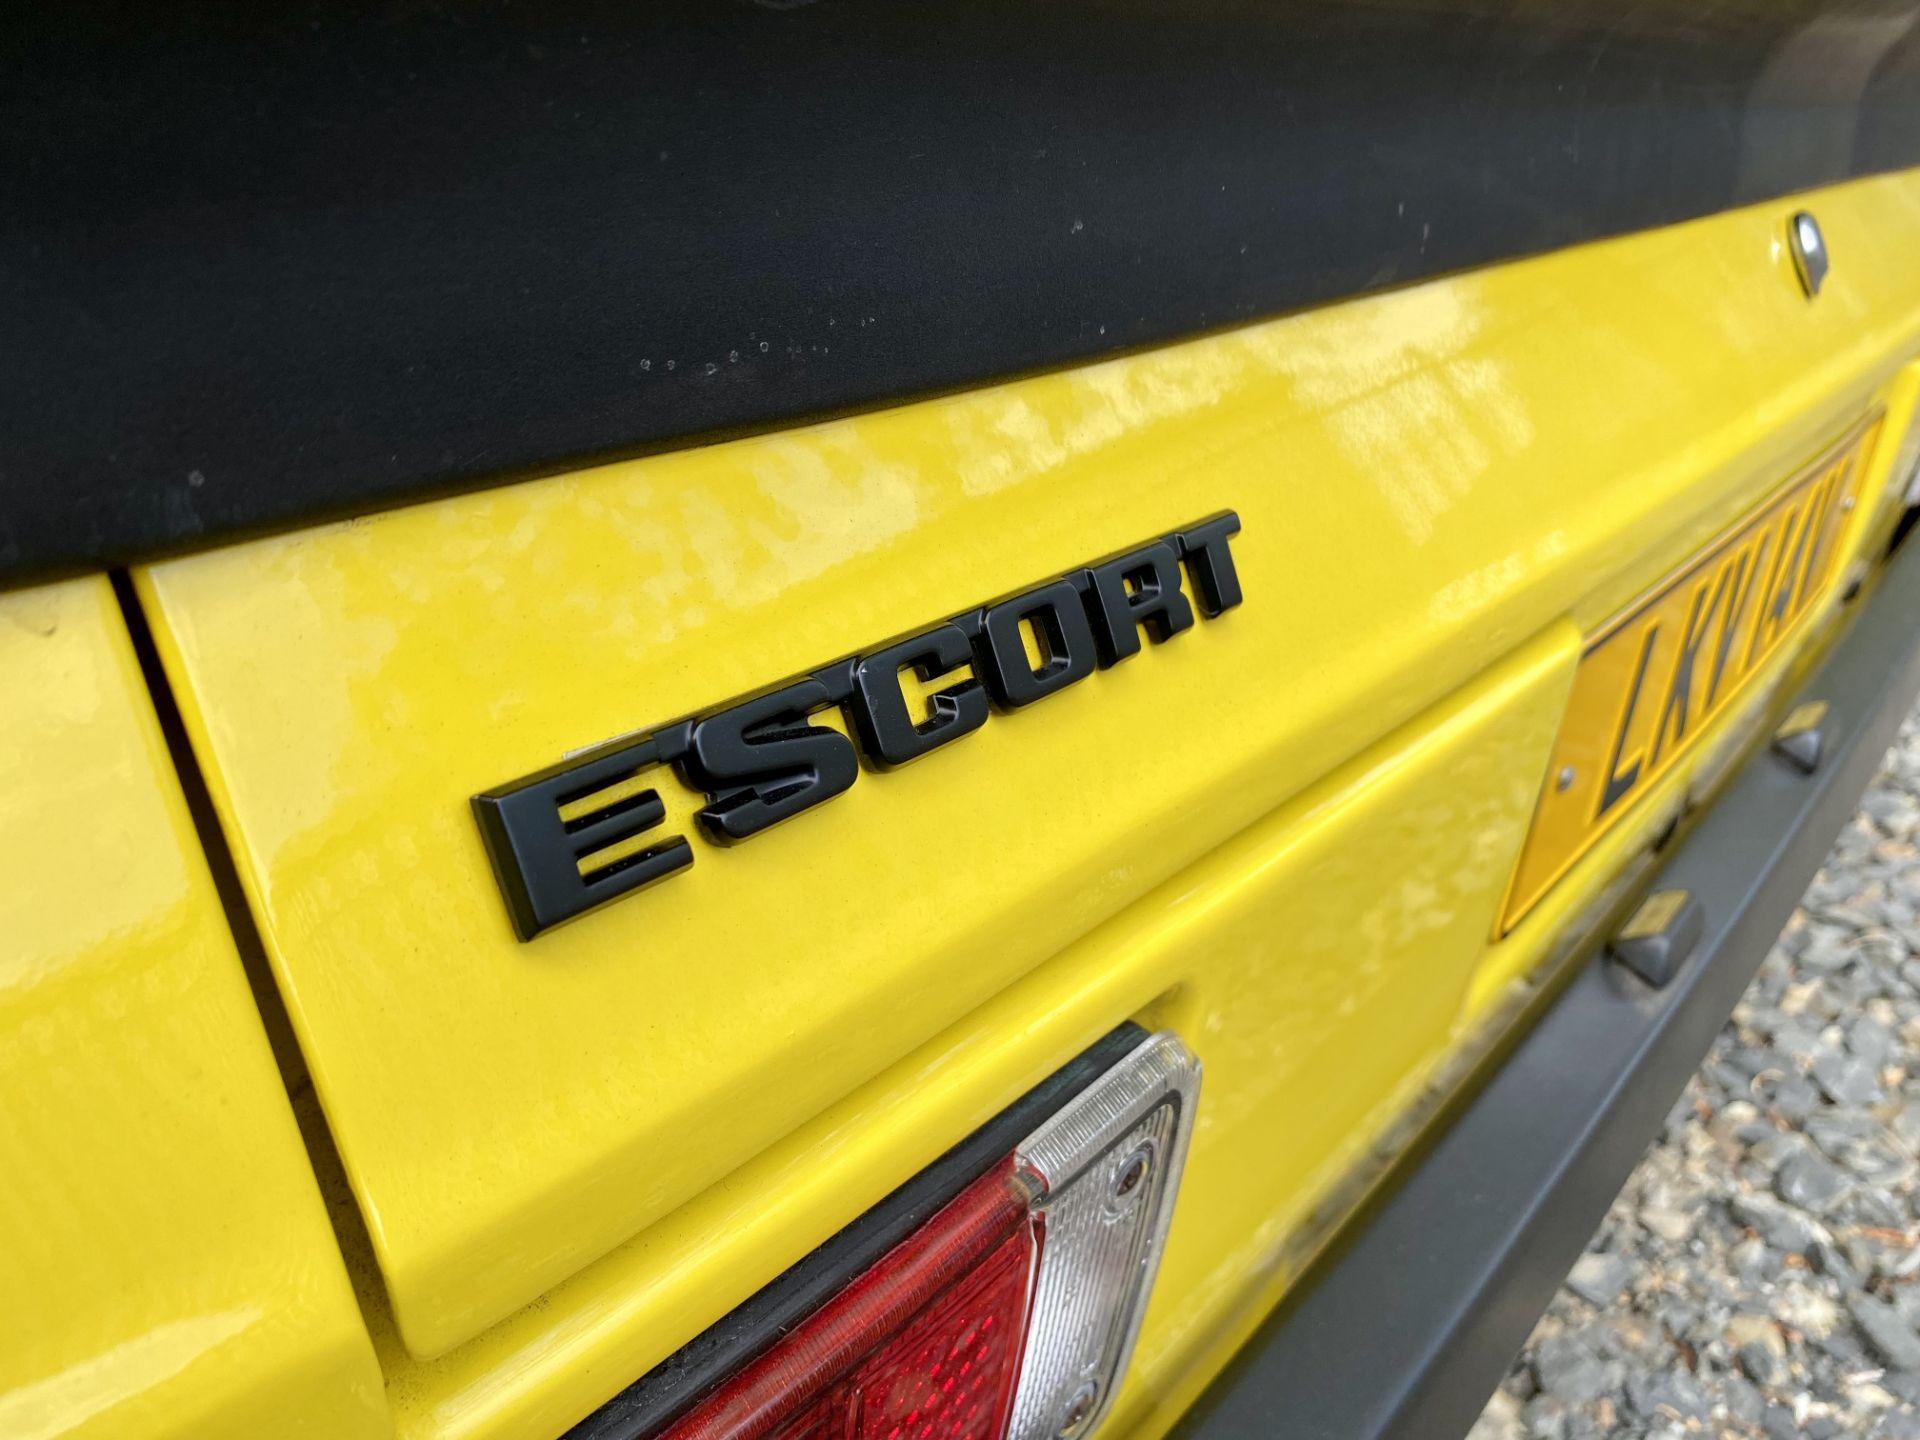 Ford Escort MK2 - Image 29 of 58